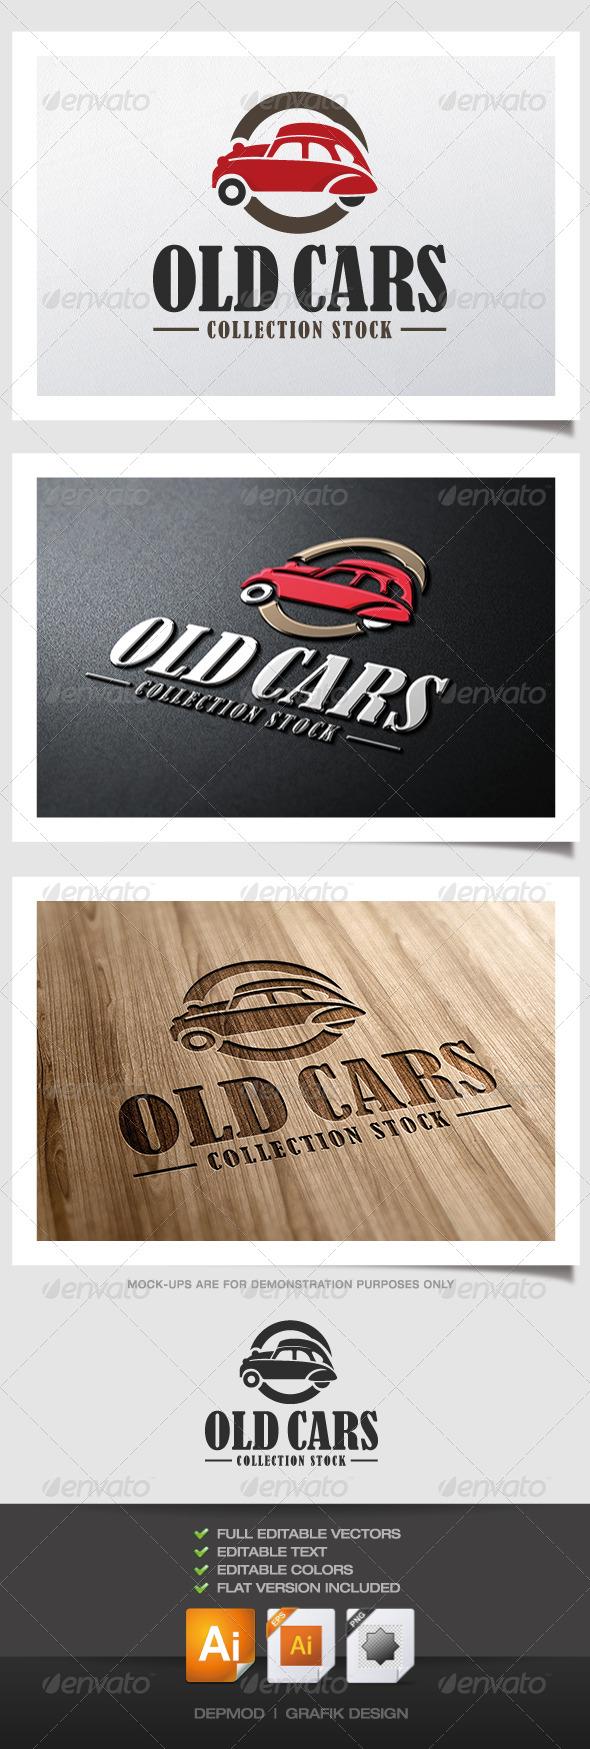 Car Logo Font Old cars logo - objects logo